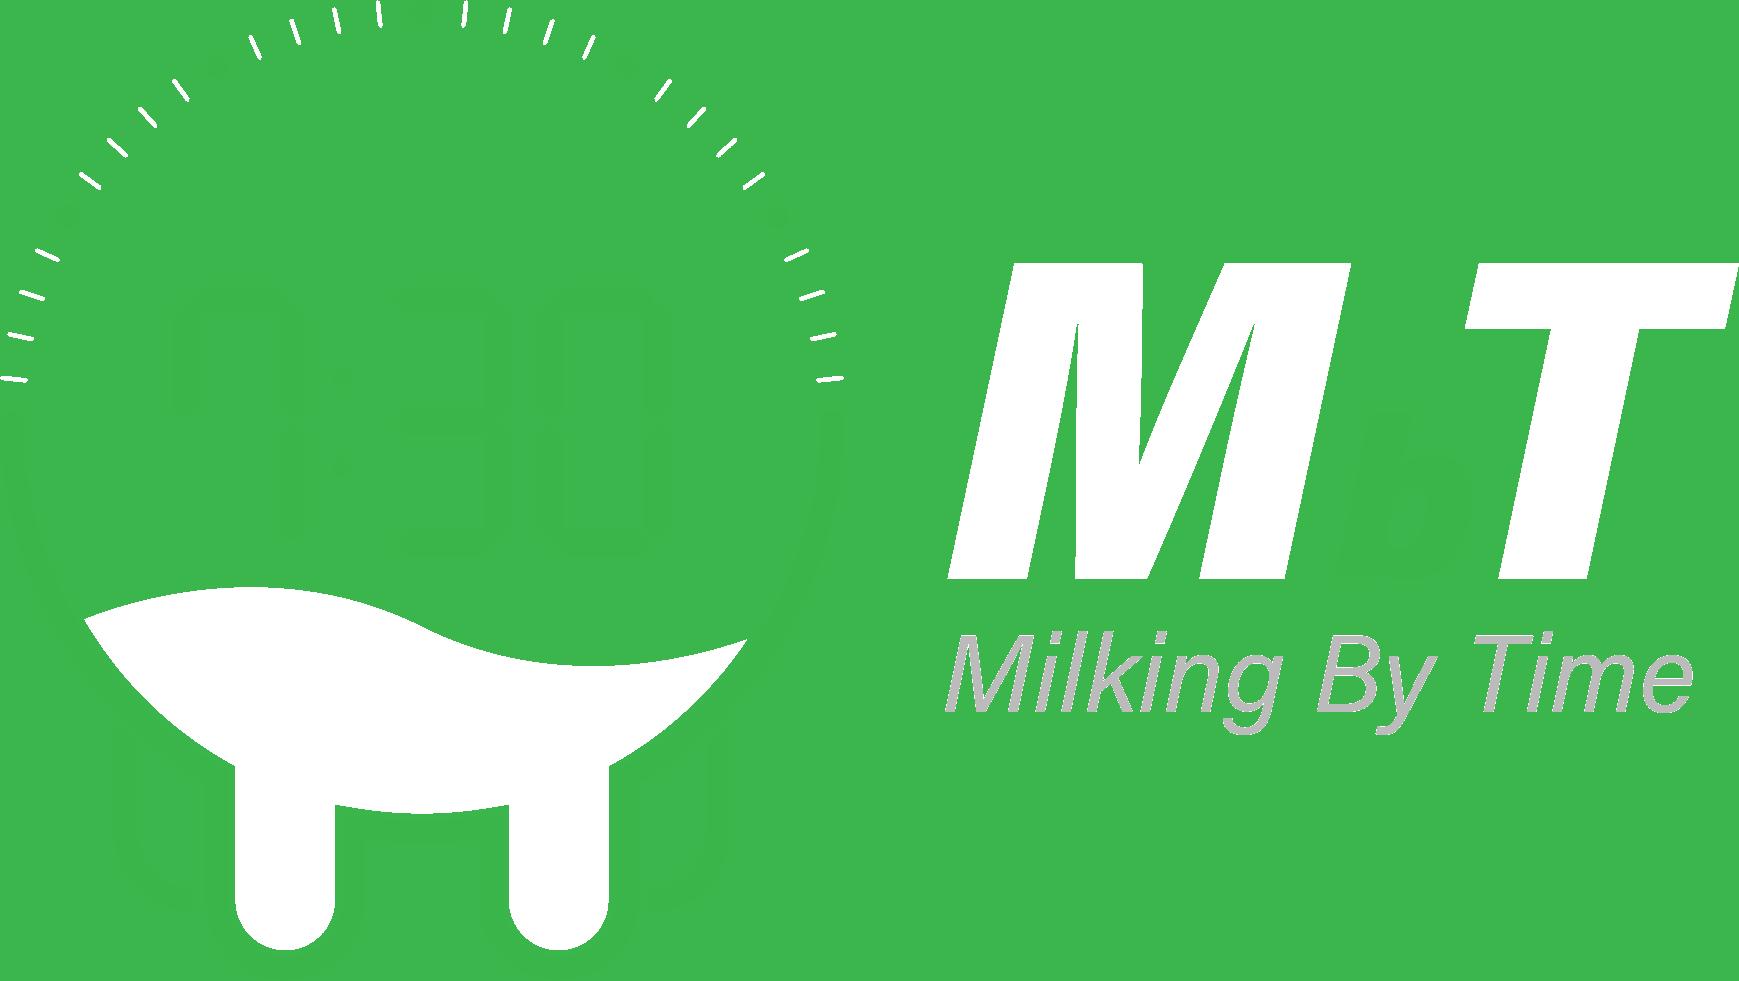 m-bt-milking-by-time-logo-black